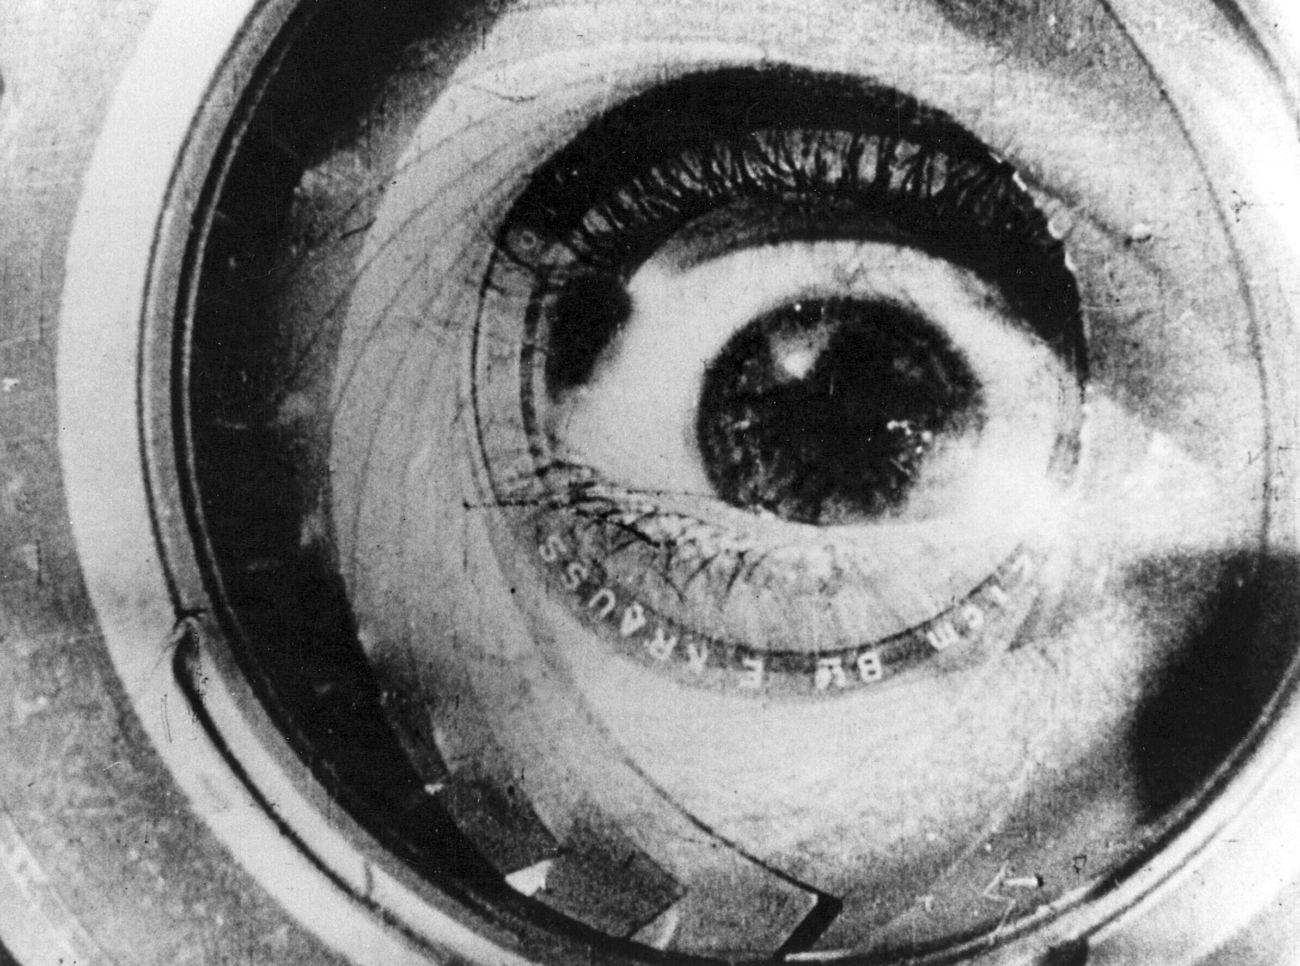 Gerçekliğin Düşleri: A Man With A Movie Camera (1929)